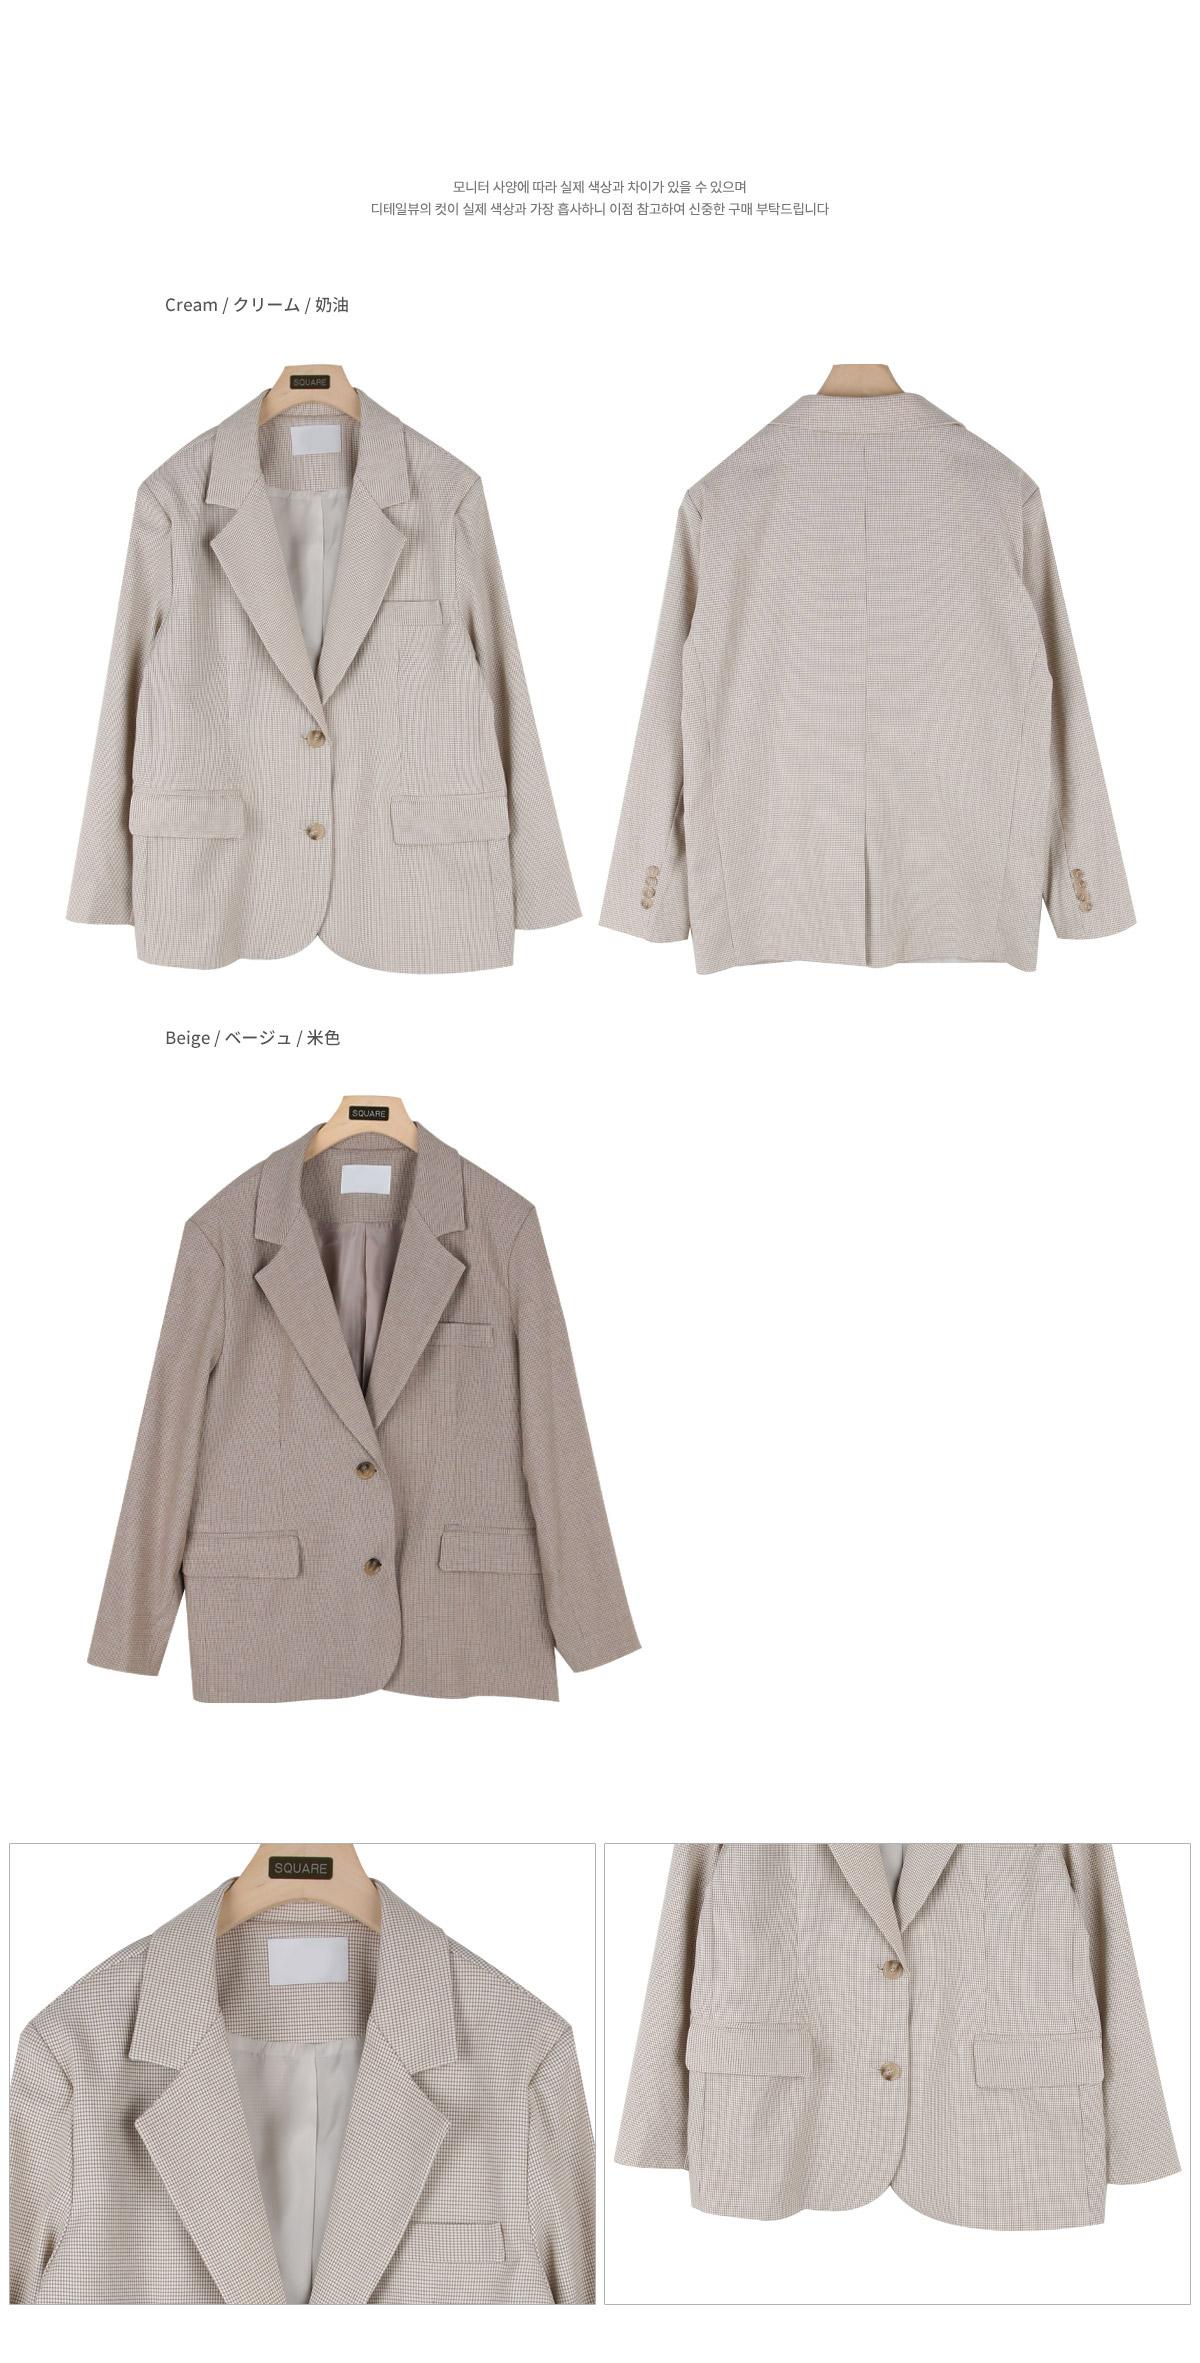 Vanilla check jacket